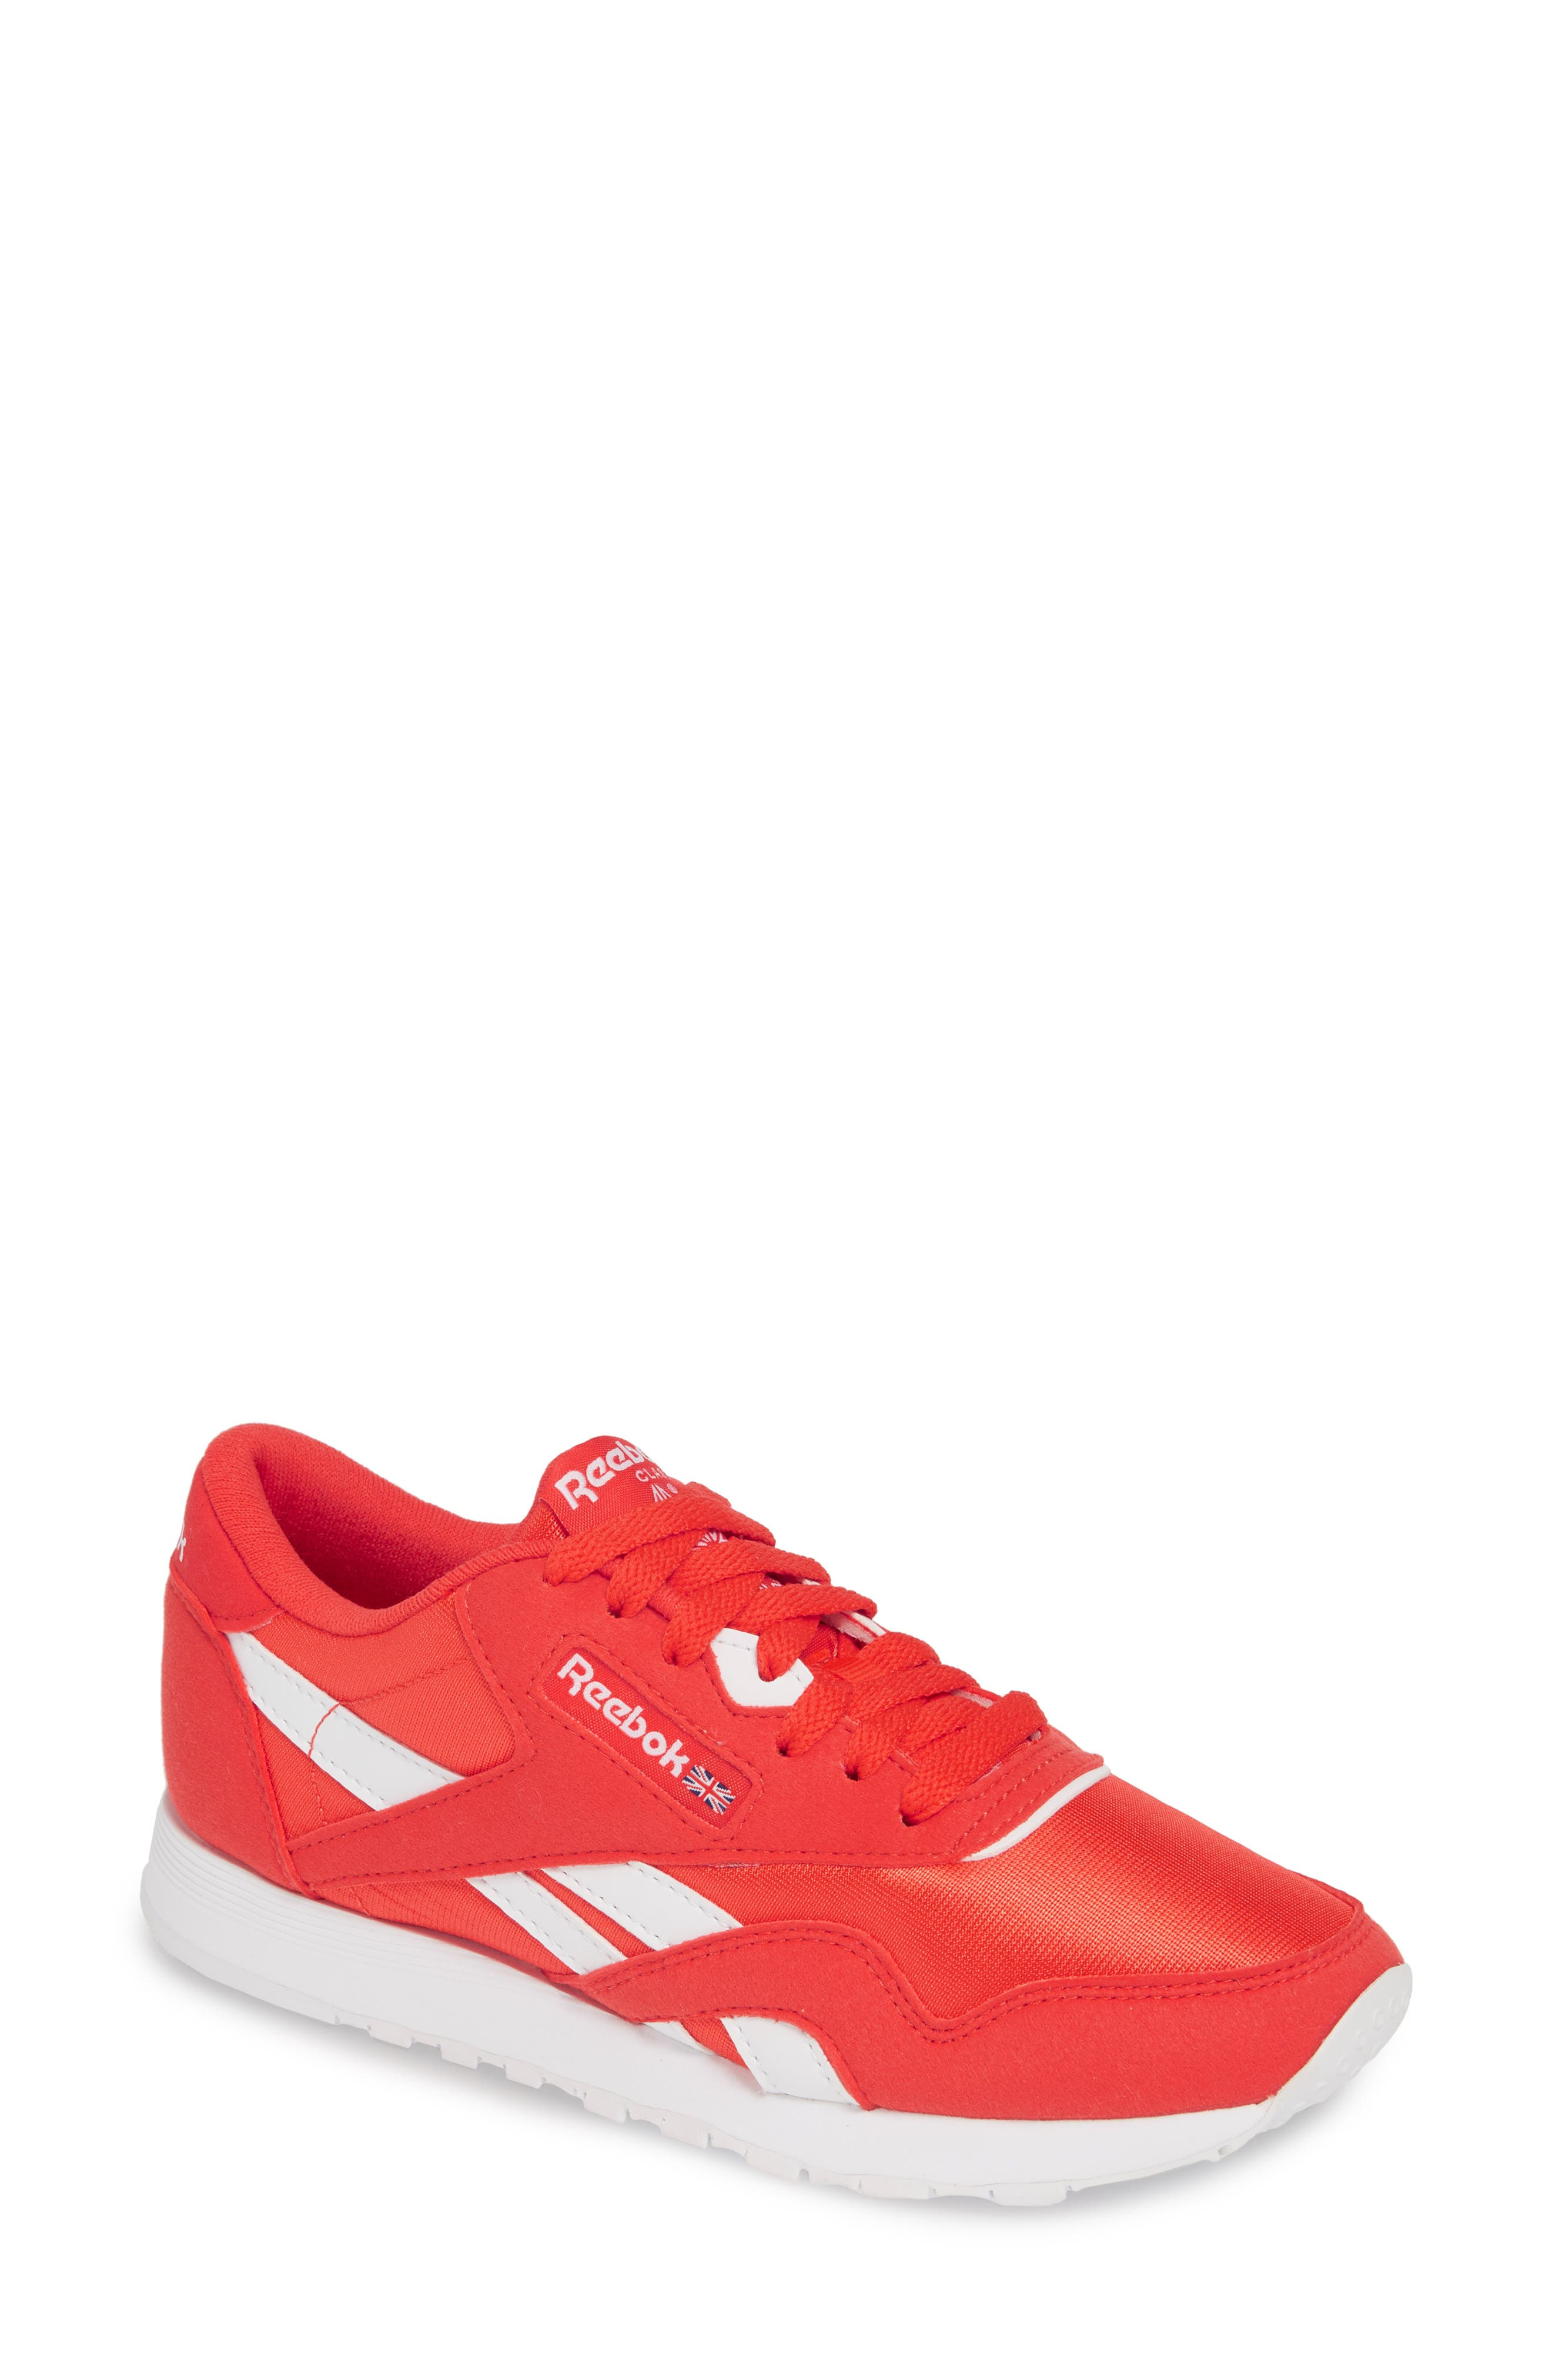 2ccfbdfdb791b Reebok Shoes